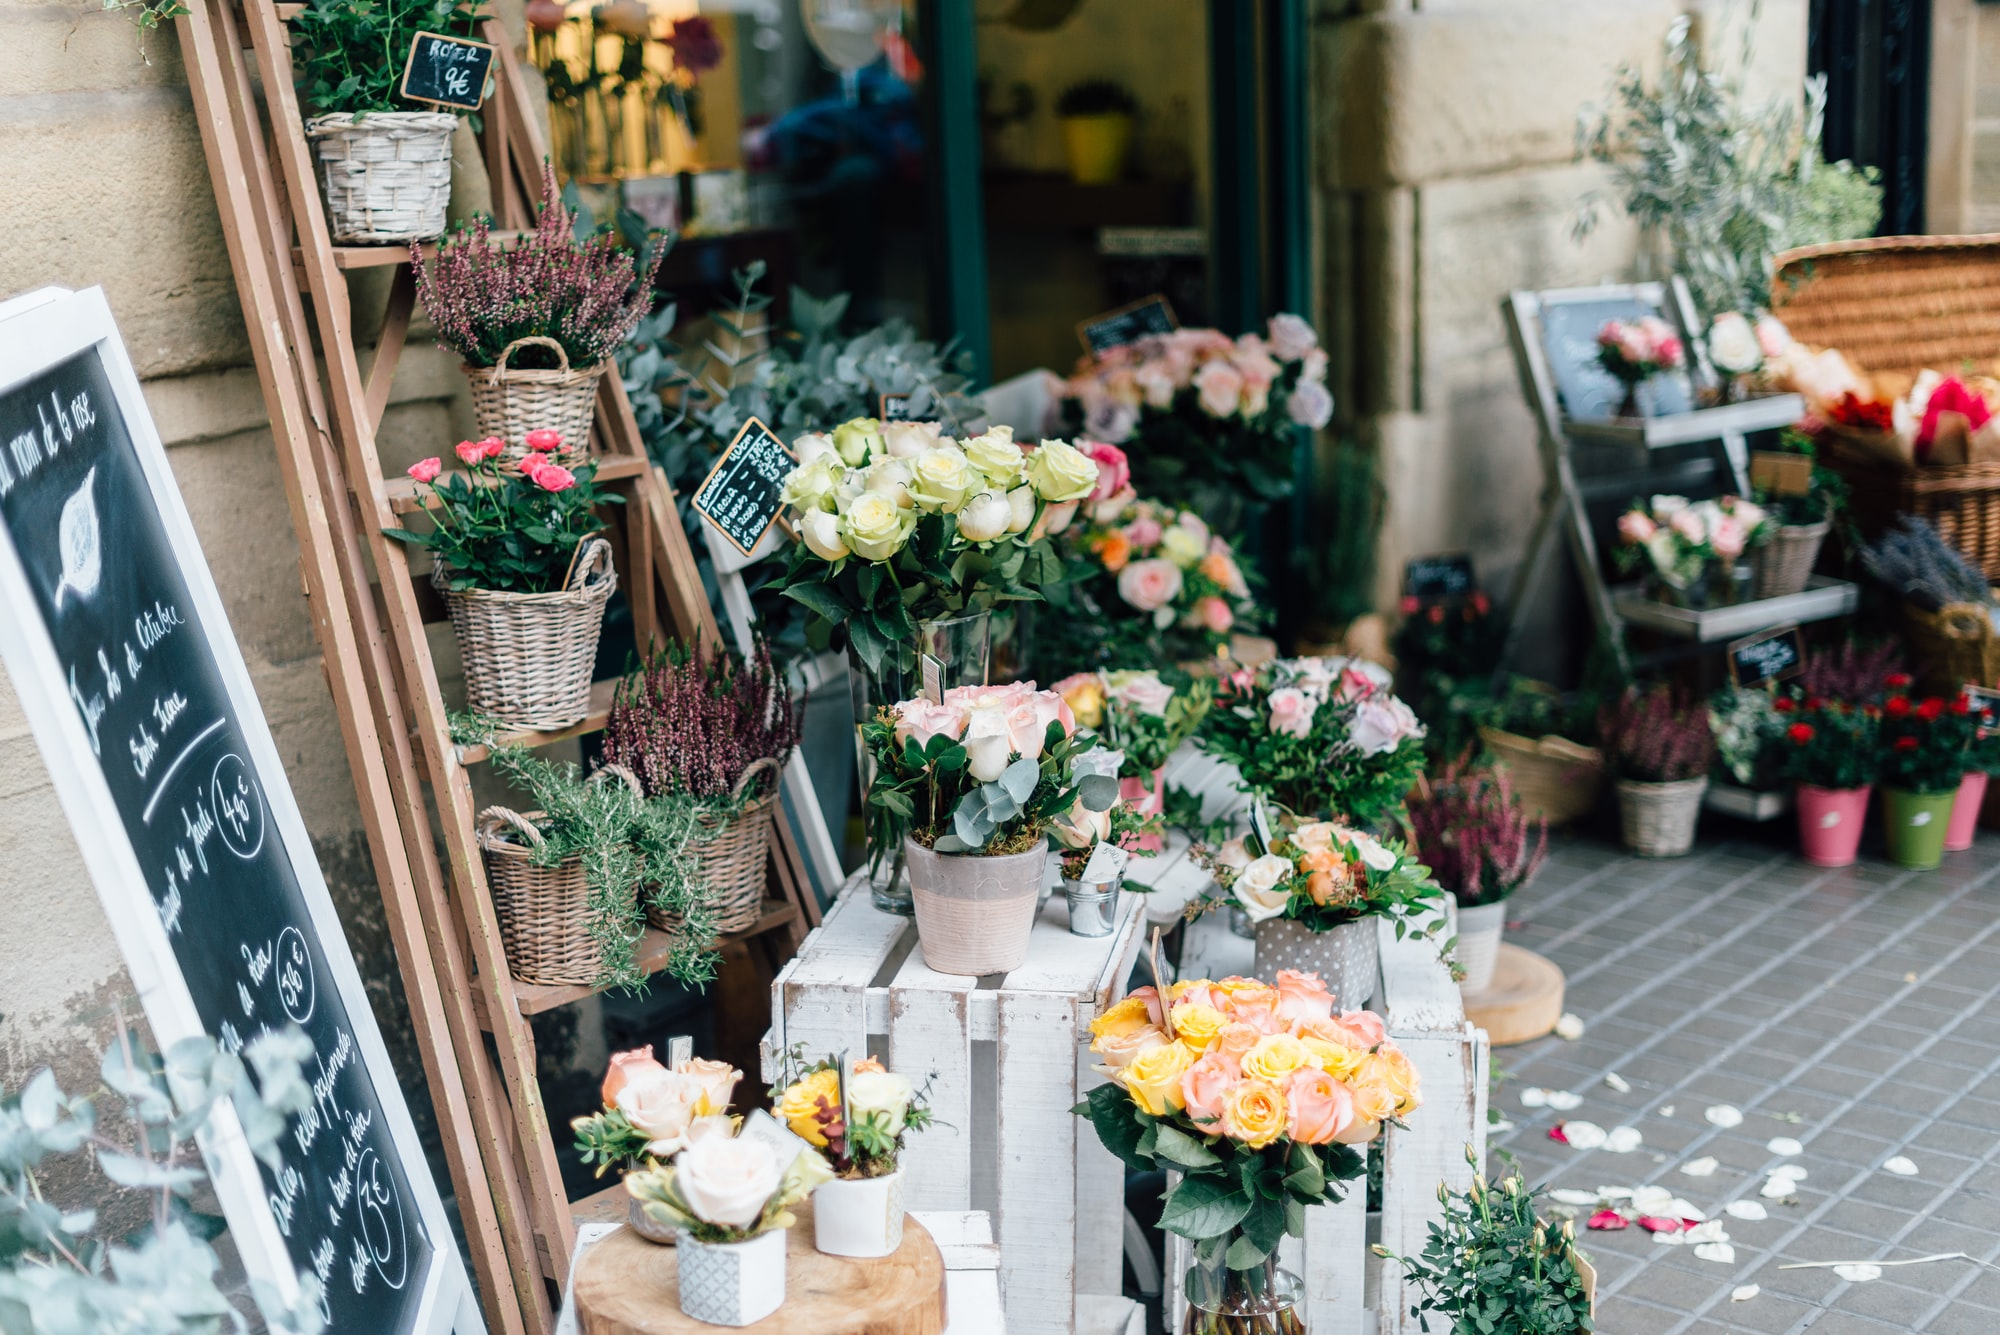 Hackerrank - Greedy Florist Solution